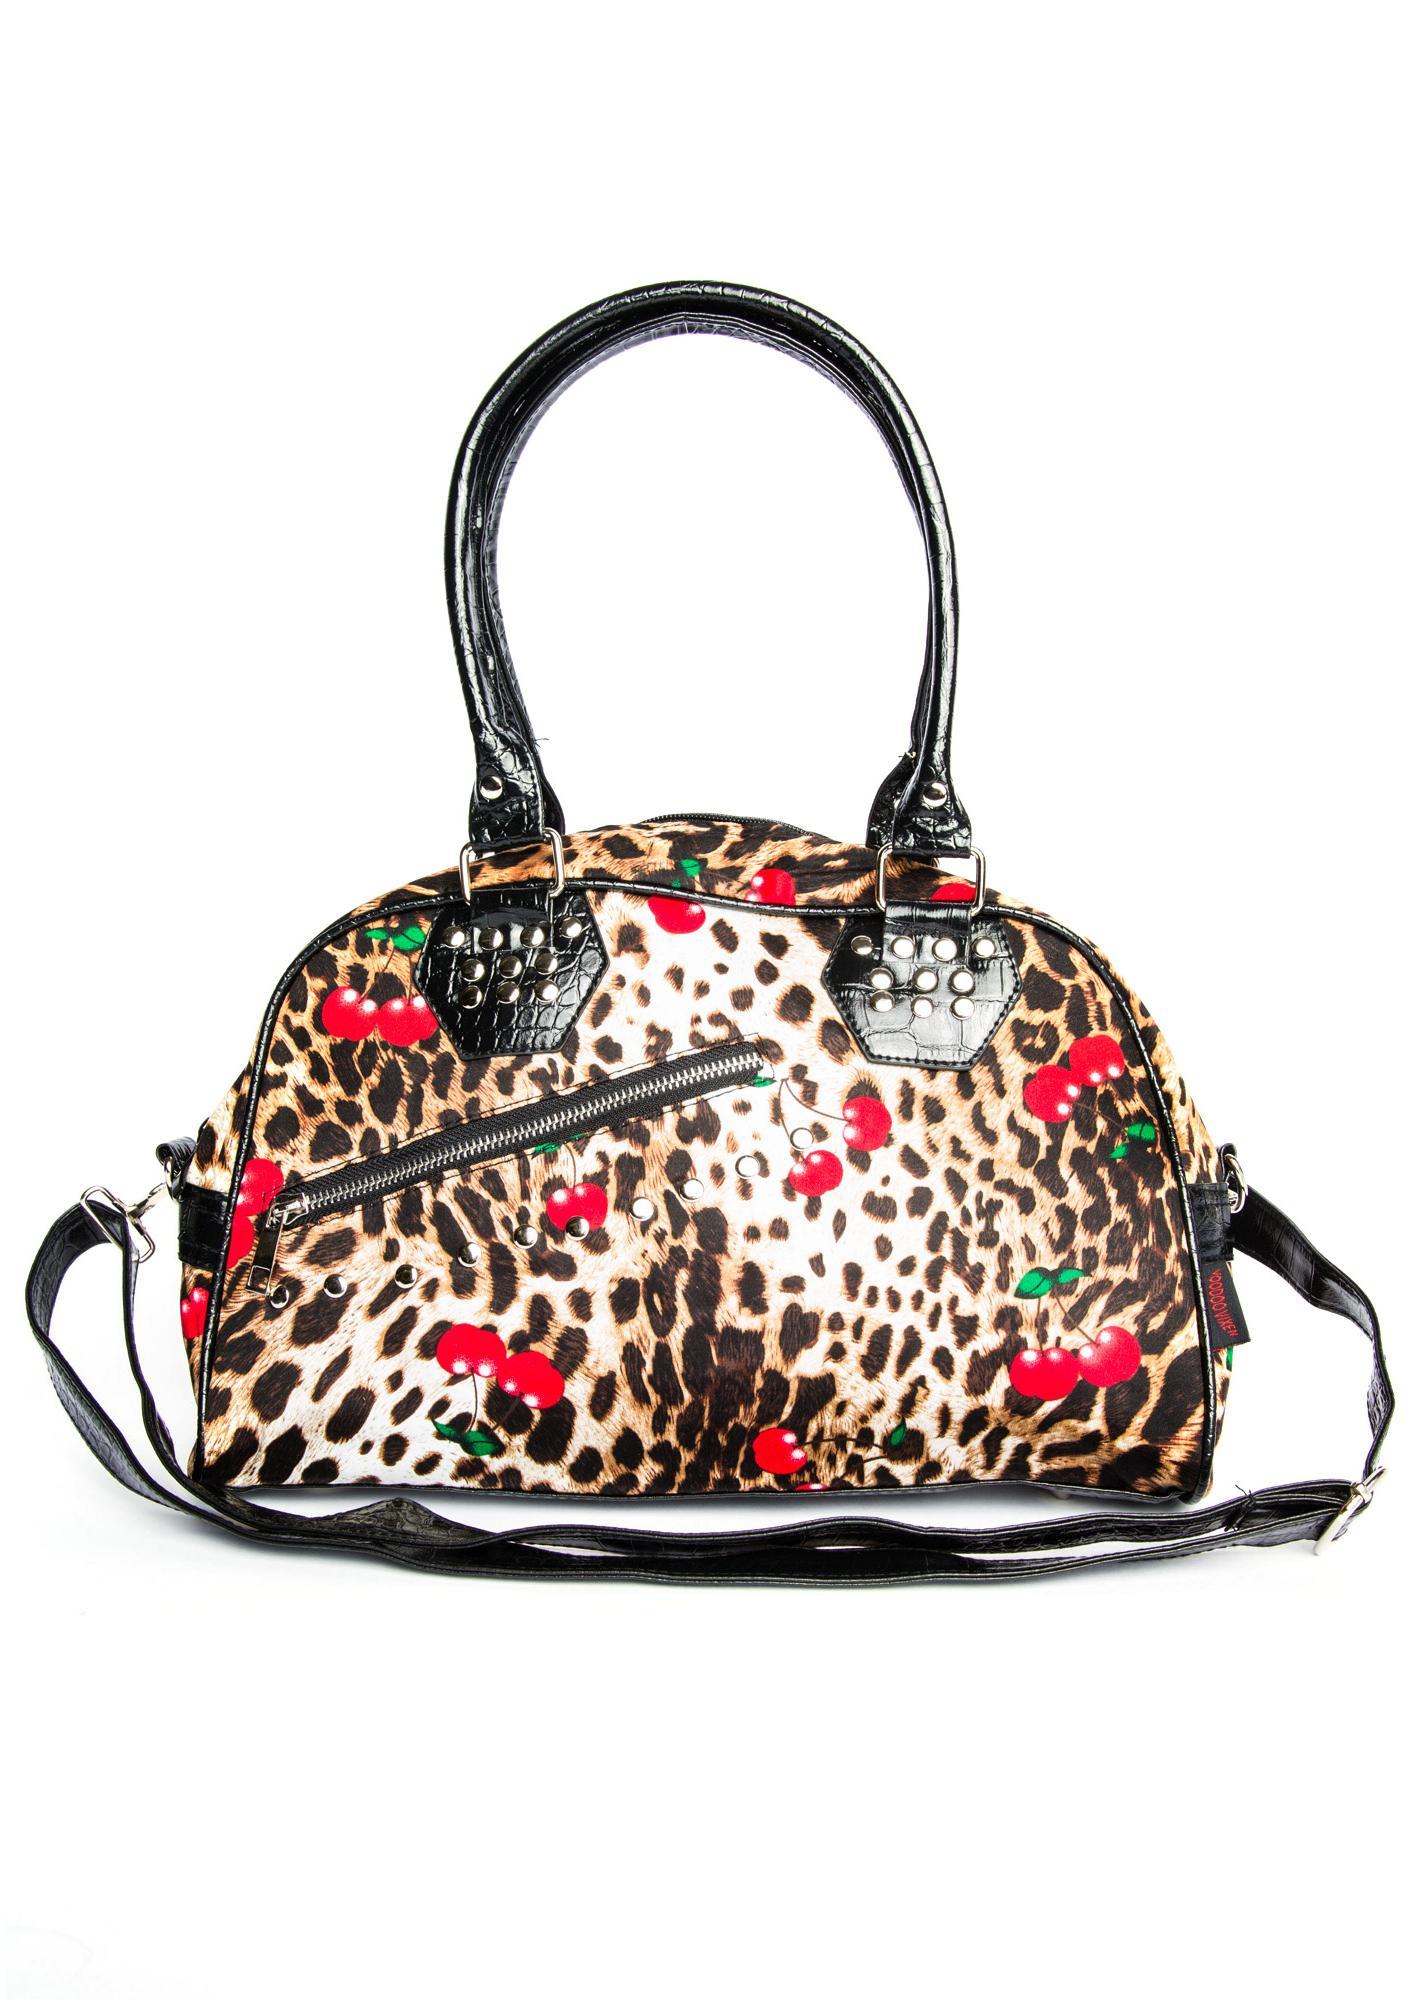 Shebangz! Leopard Cherry Handbag